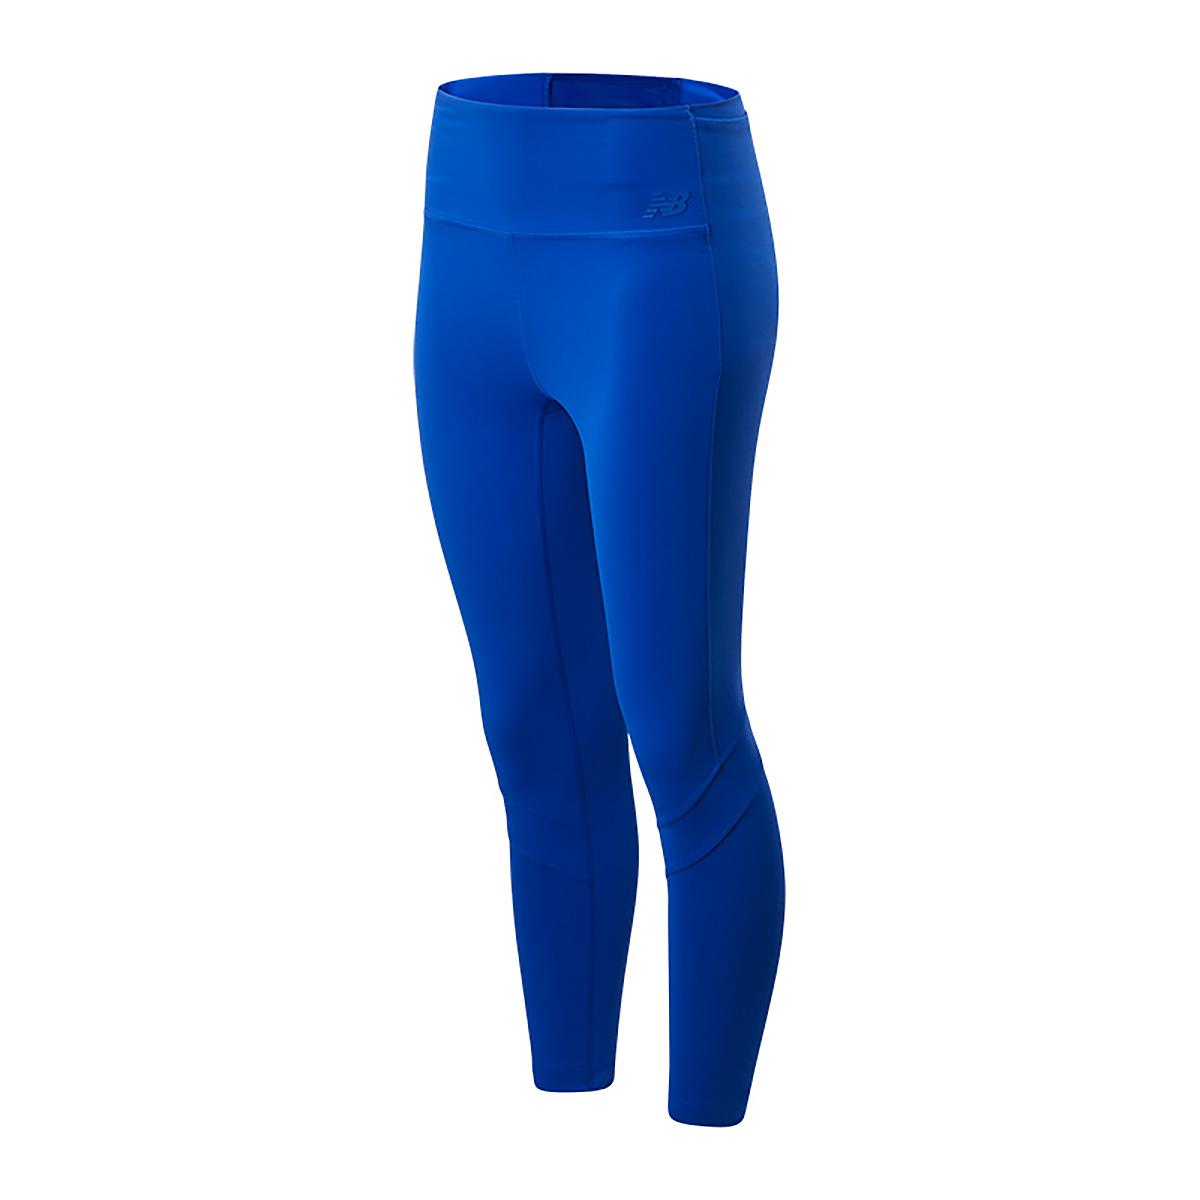 Women's New Balance Transform High Rise Pocket Crop - Color: Marine Blue - Size: XS, Marine Blue, large, image 1